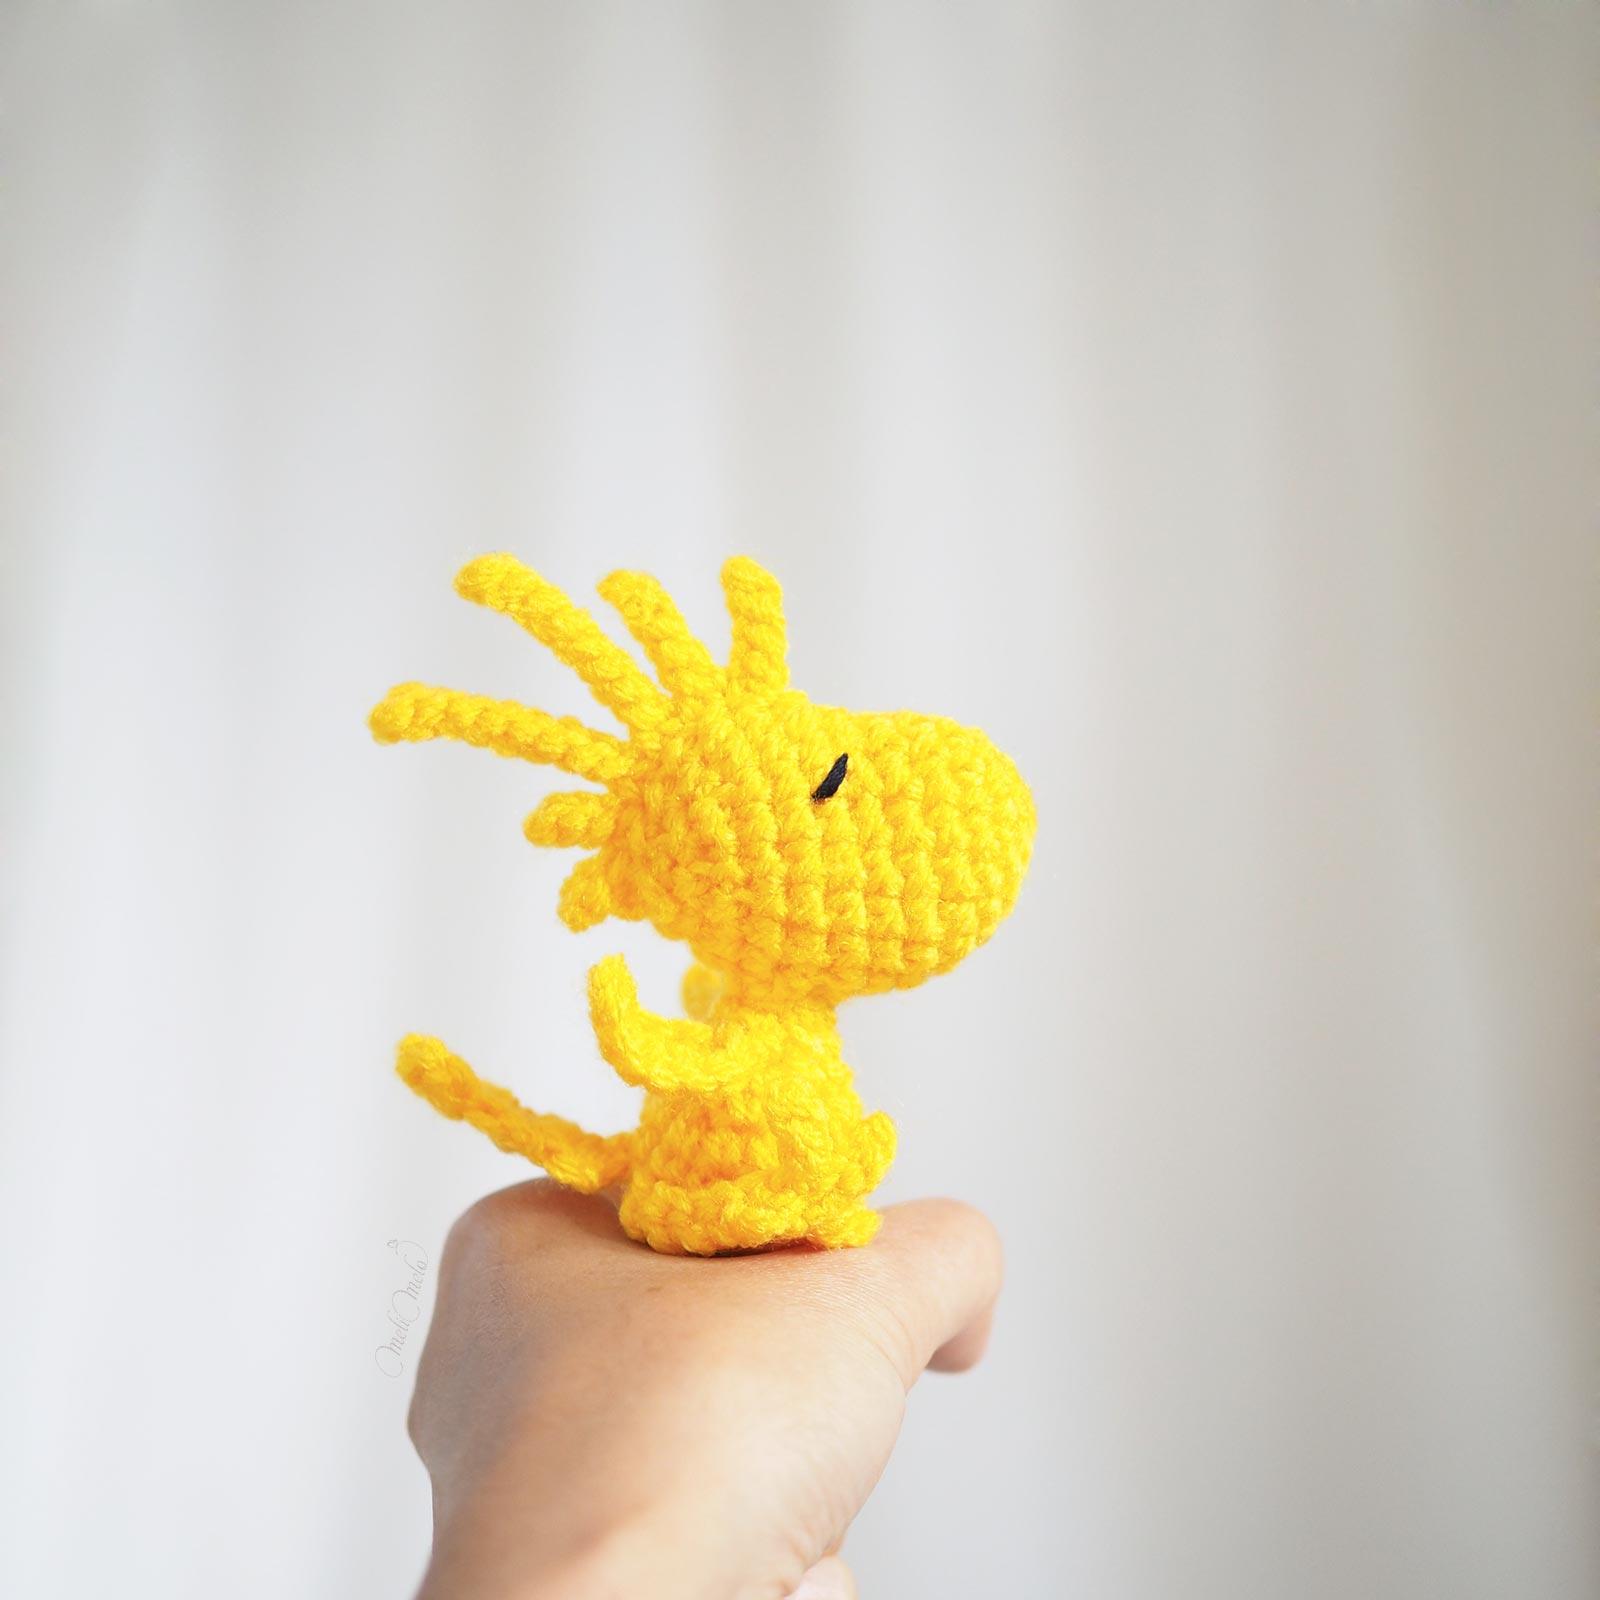 crochetbymelimelo amigurumi Woodstock Peanuts happycrochetetc canari jaune taille laboutiquedemelimelo